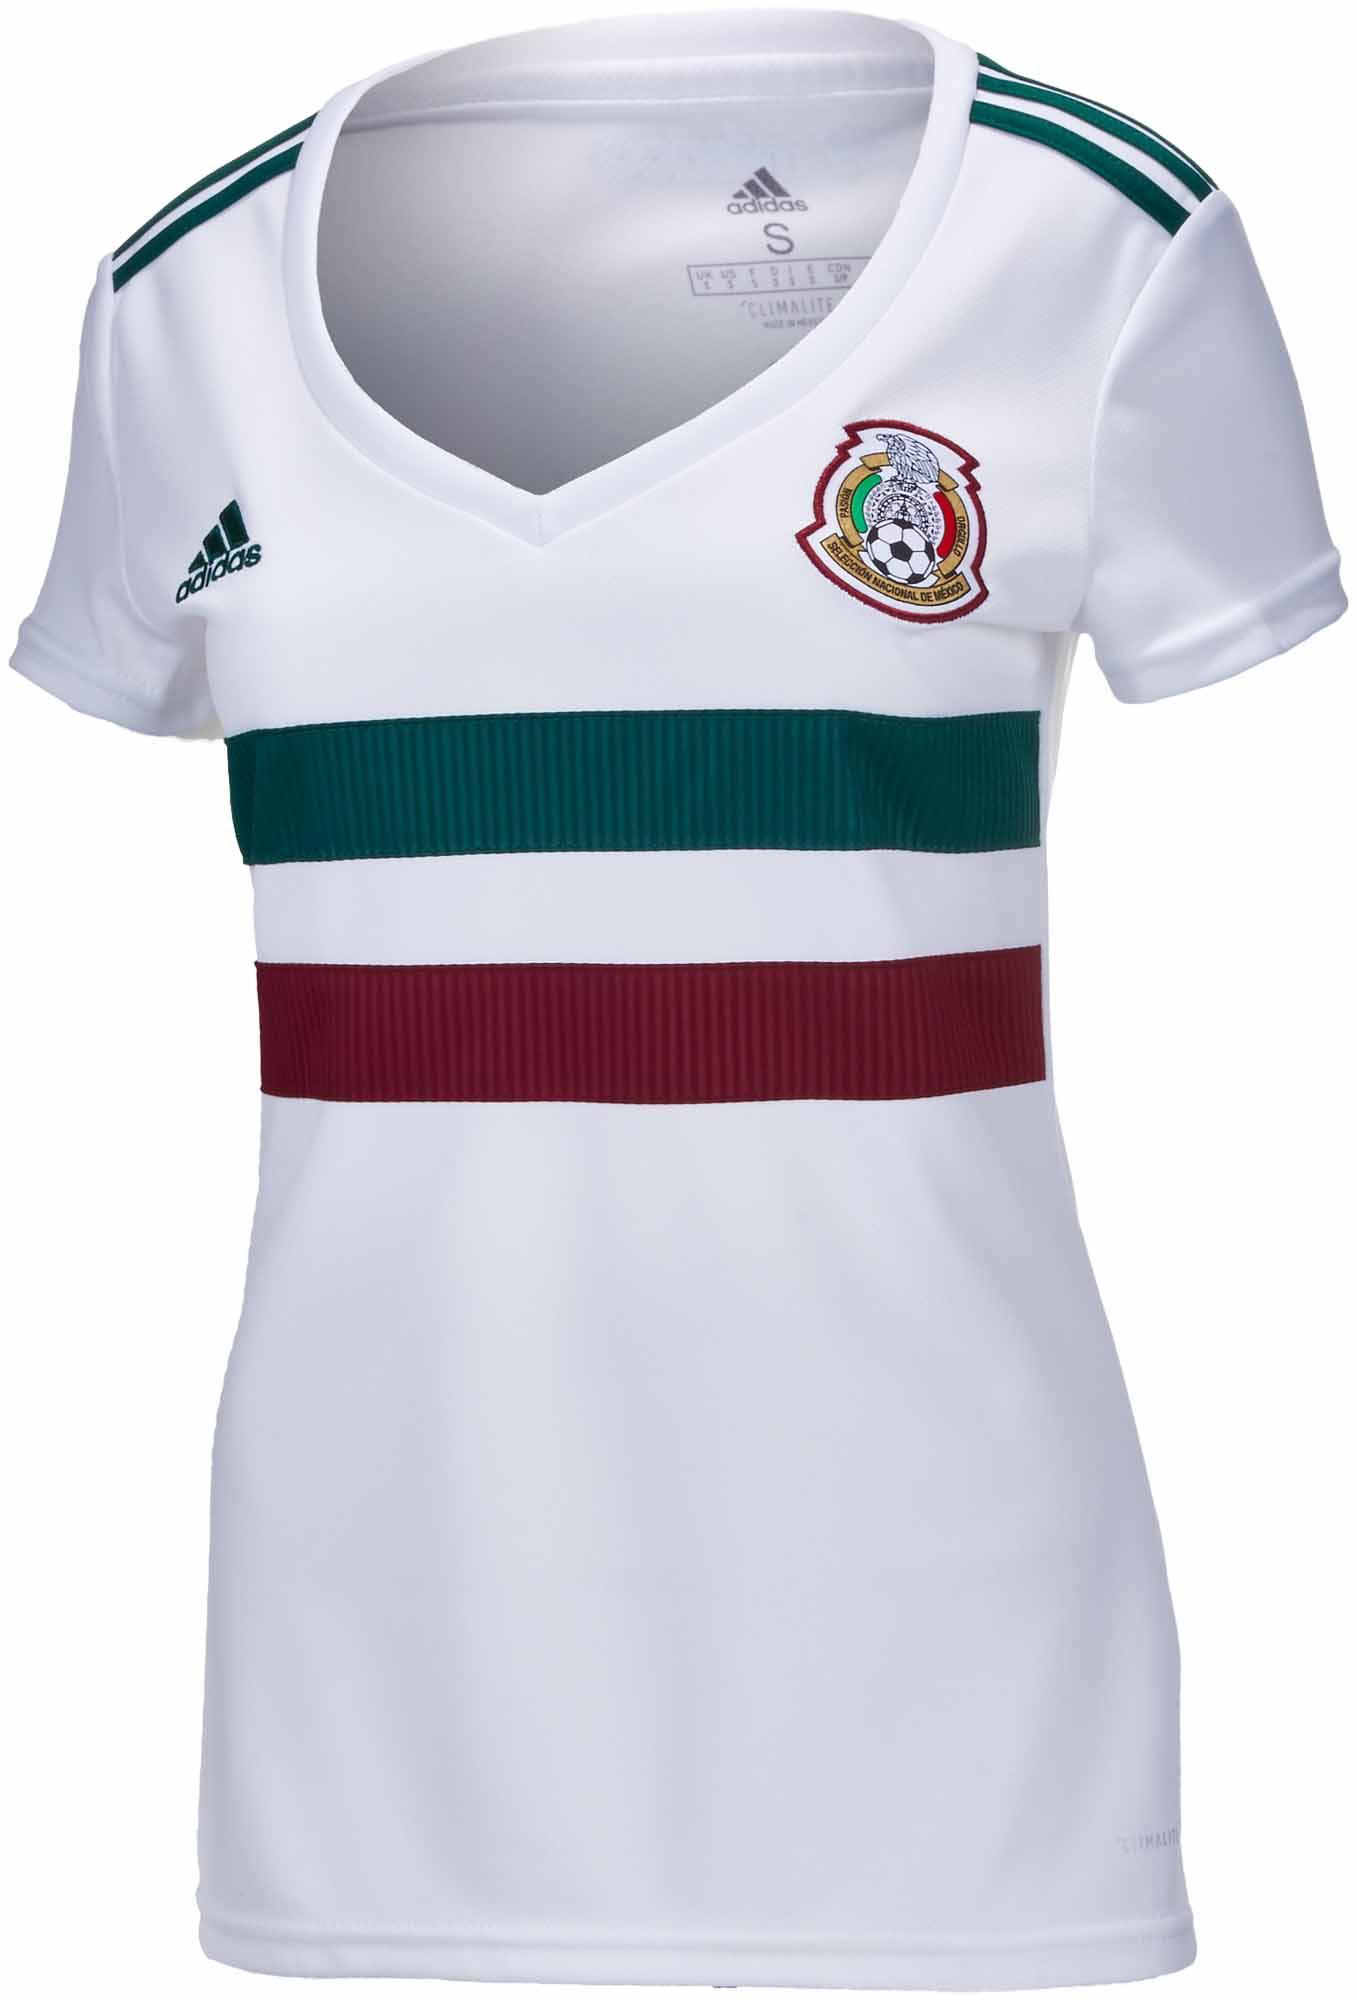 1f1c3810ba6 adidas Mexico Away Jersey - Womens 2018-19 - SoccerPro.com